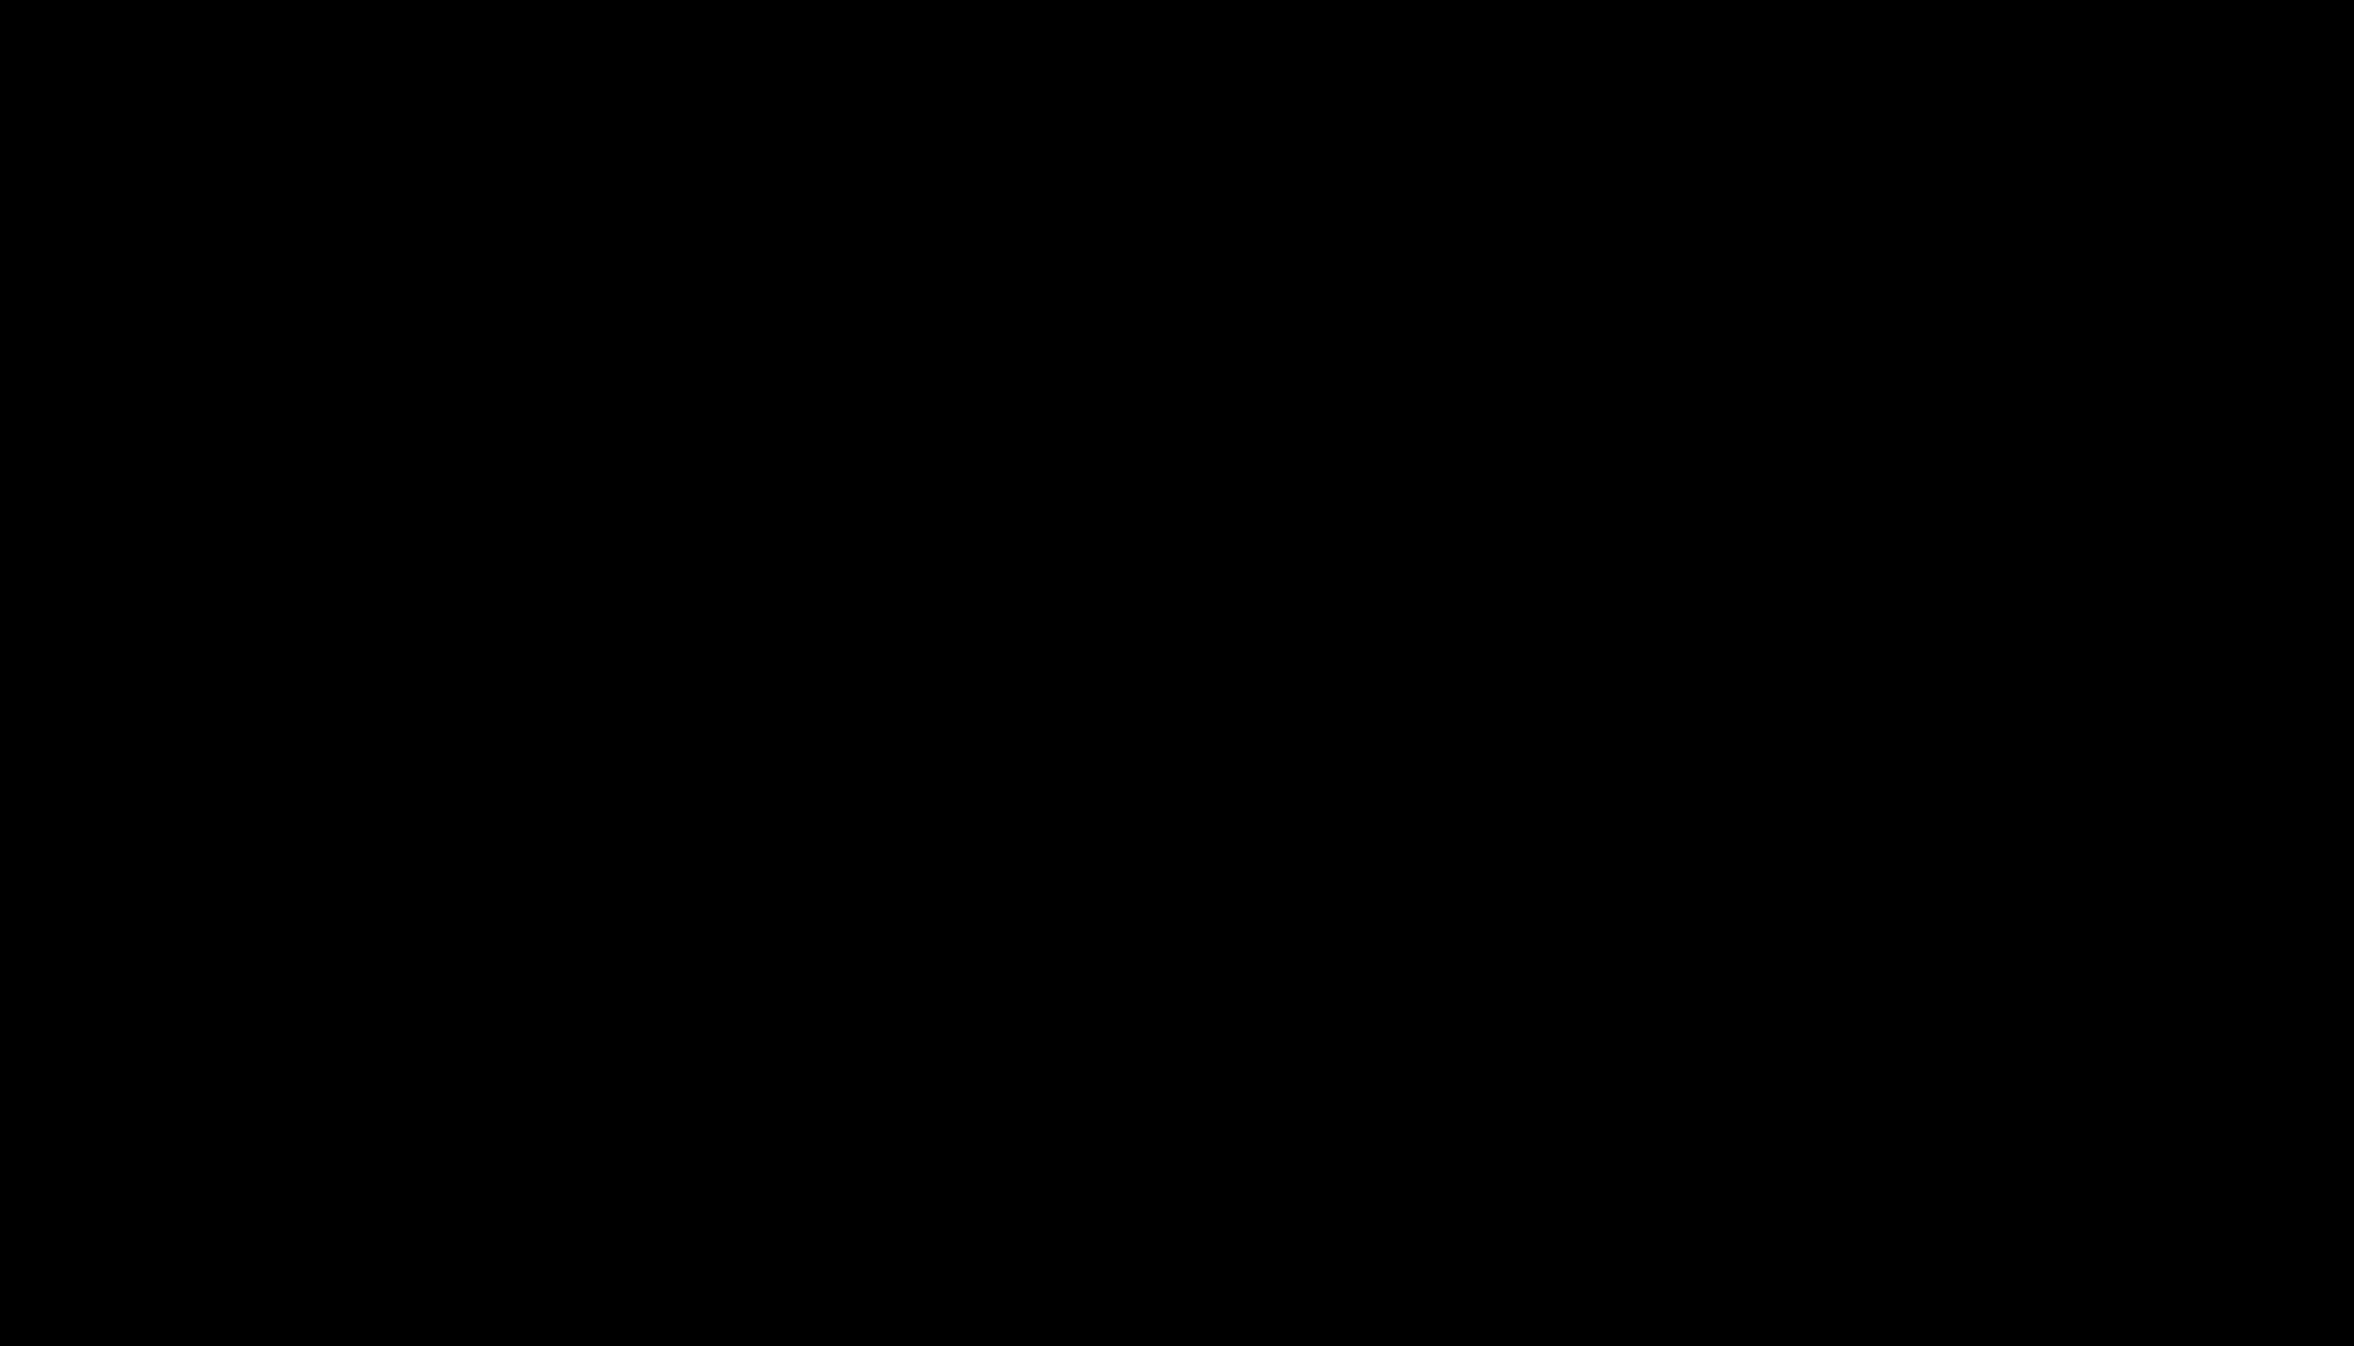 Dibenzocyclooctyne-PEG4-biotin conjugate